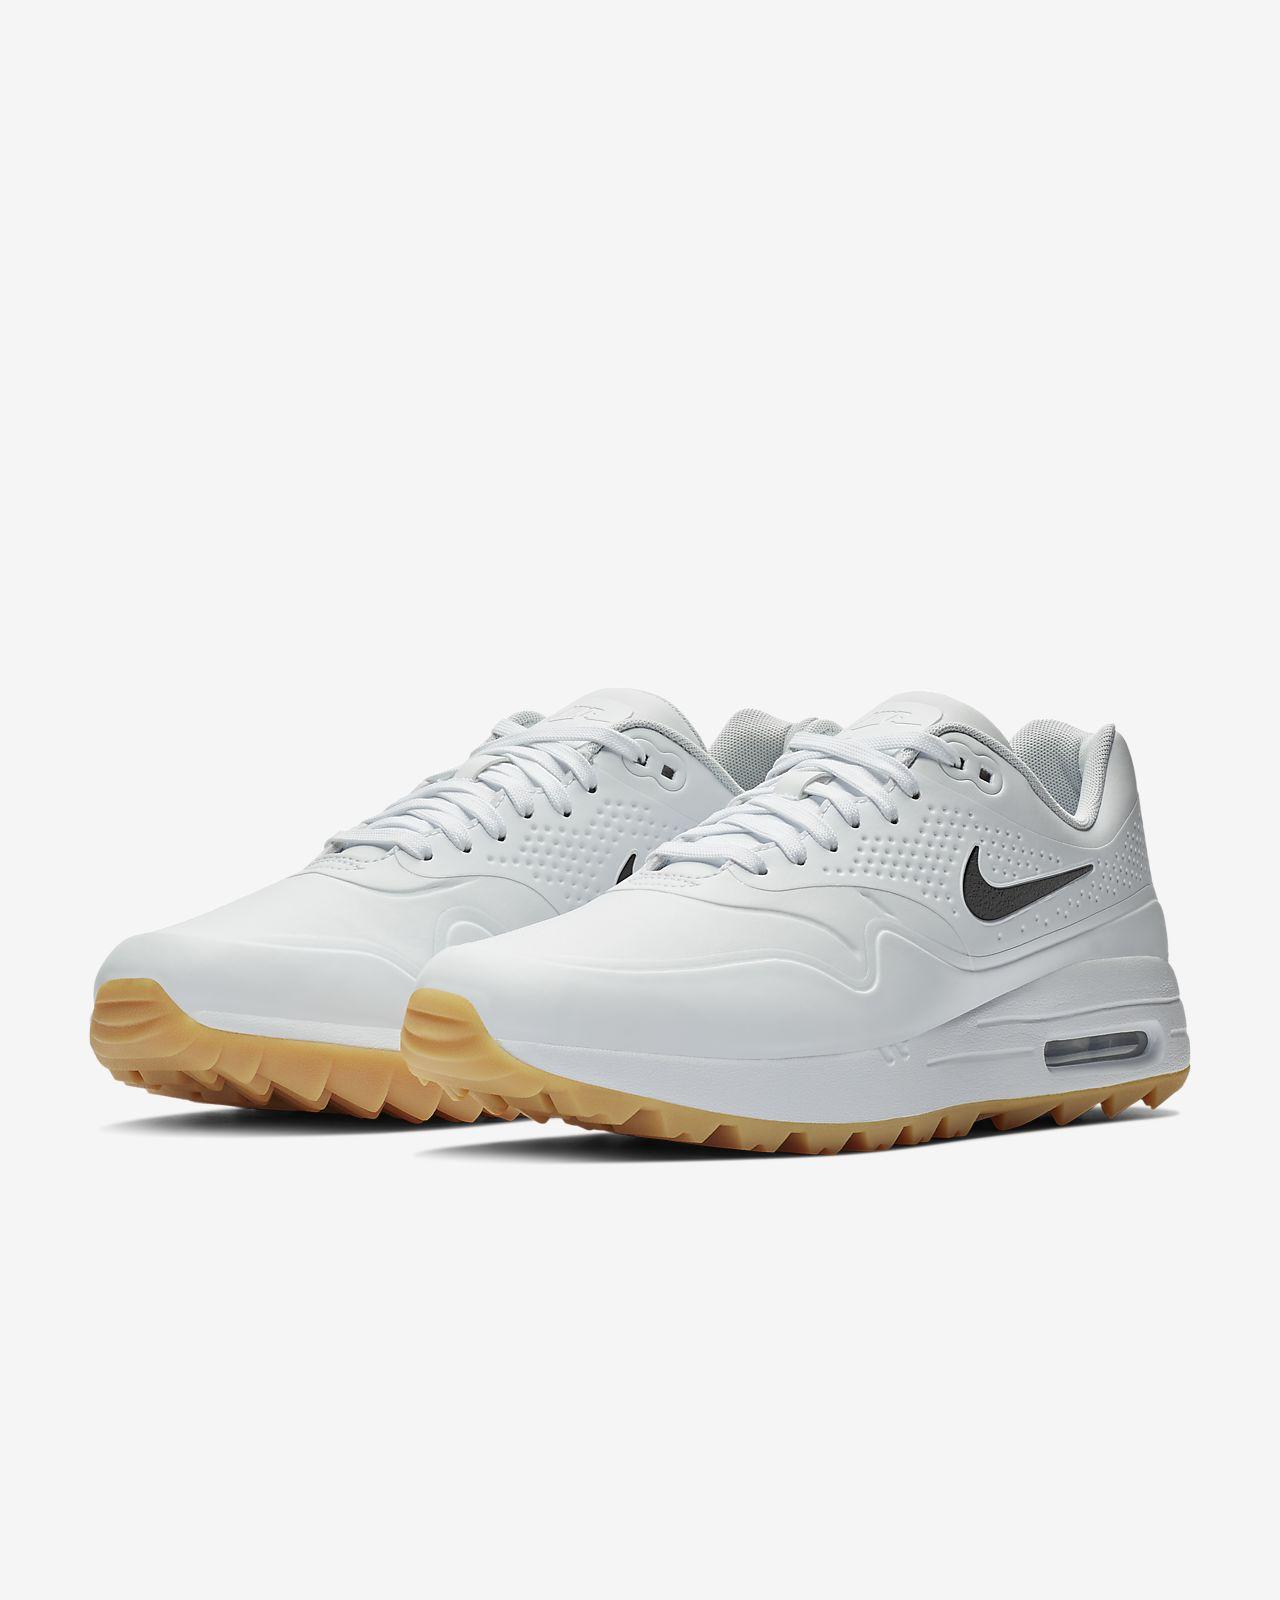 d94c9b907316 Nike Air Max 1 G Men s Golf Shoe. Nike.com DK